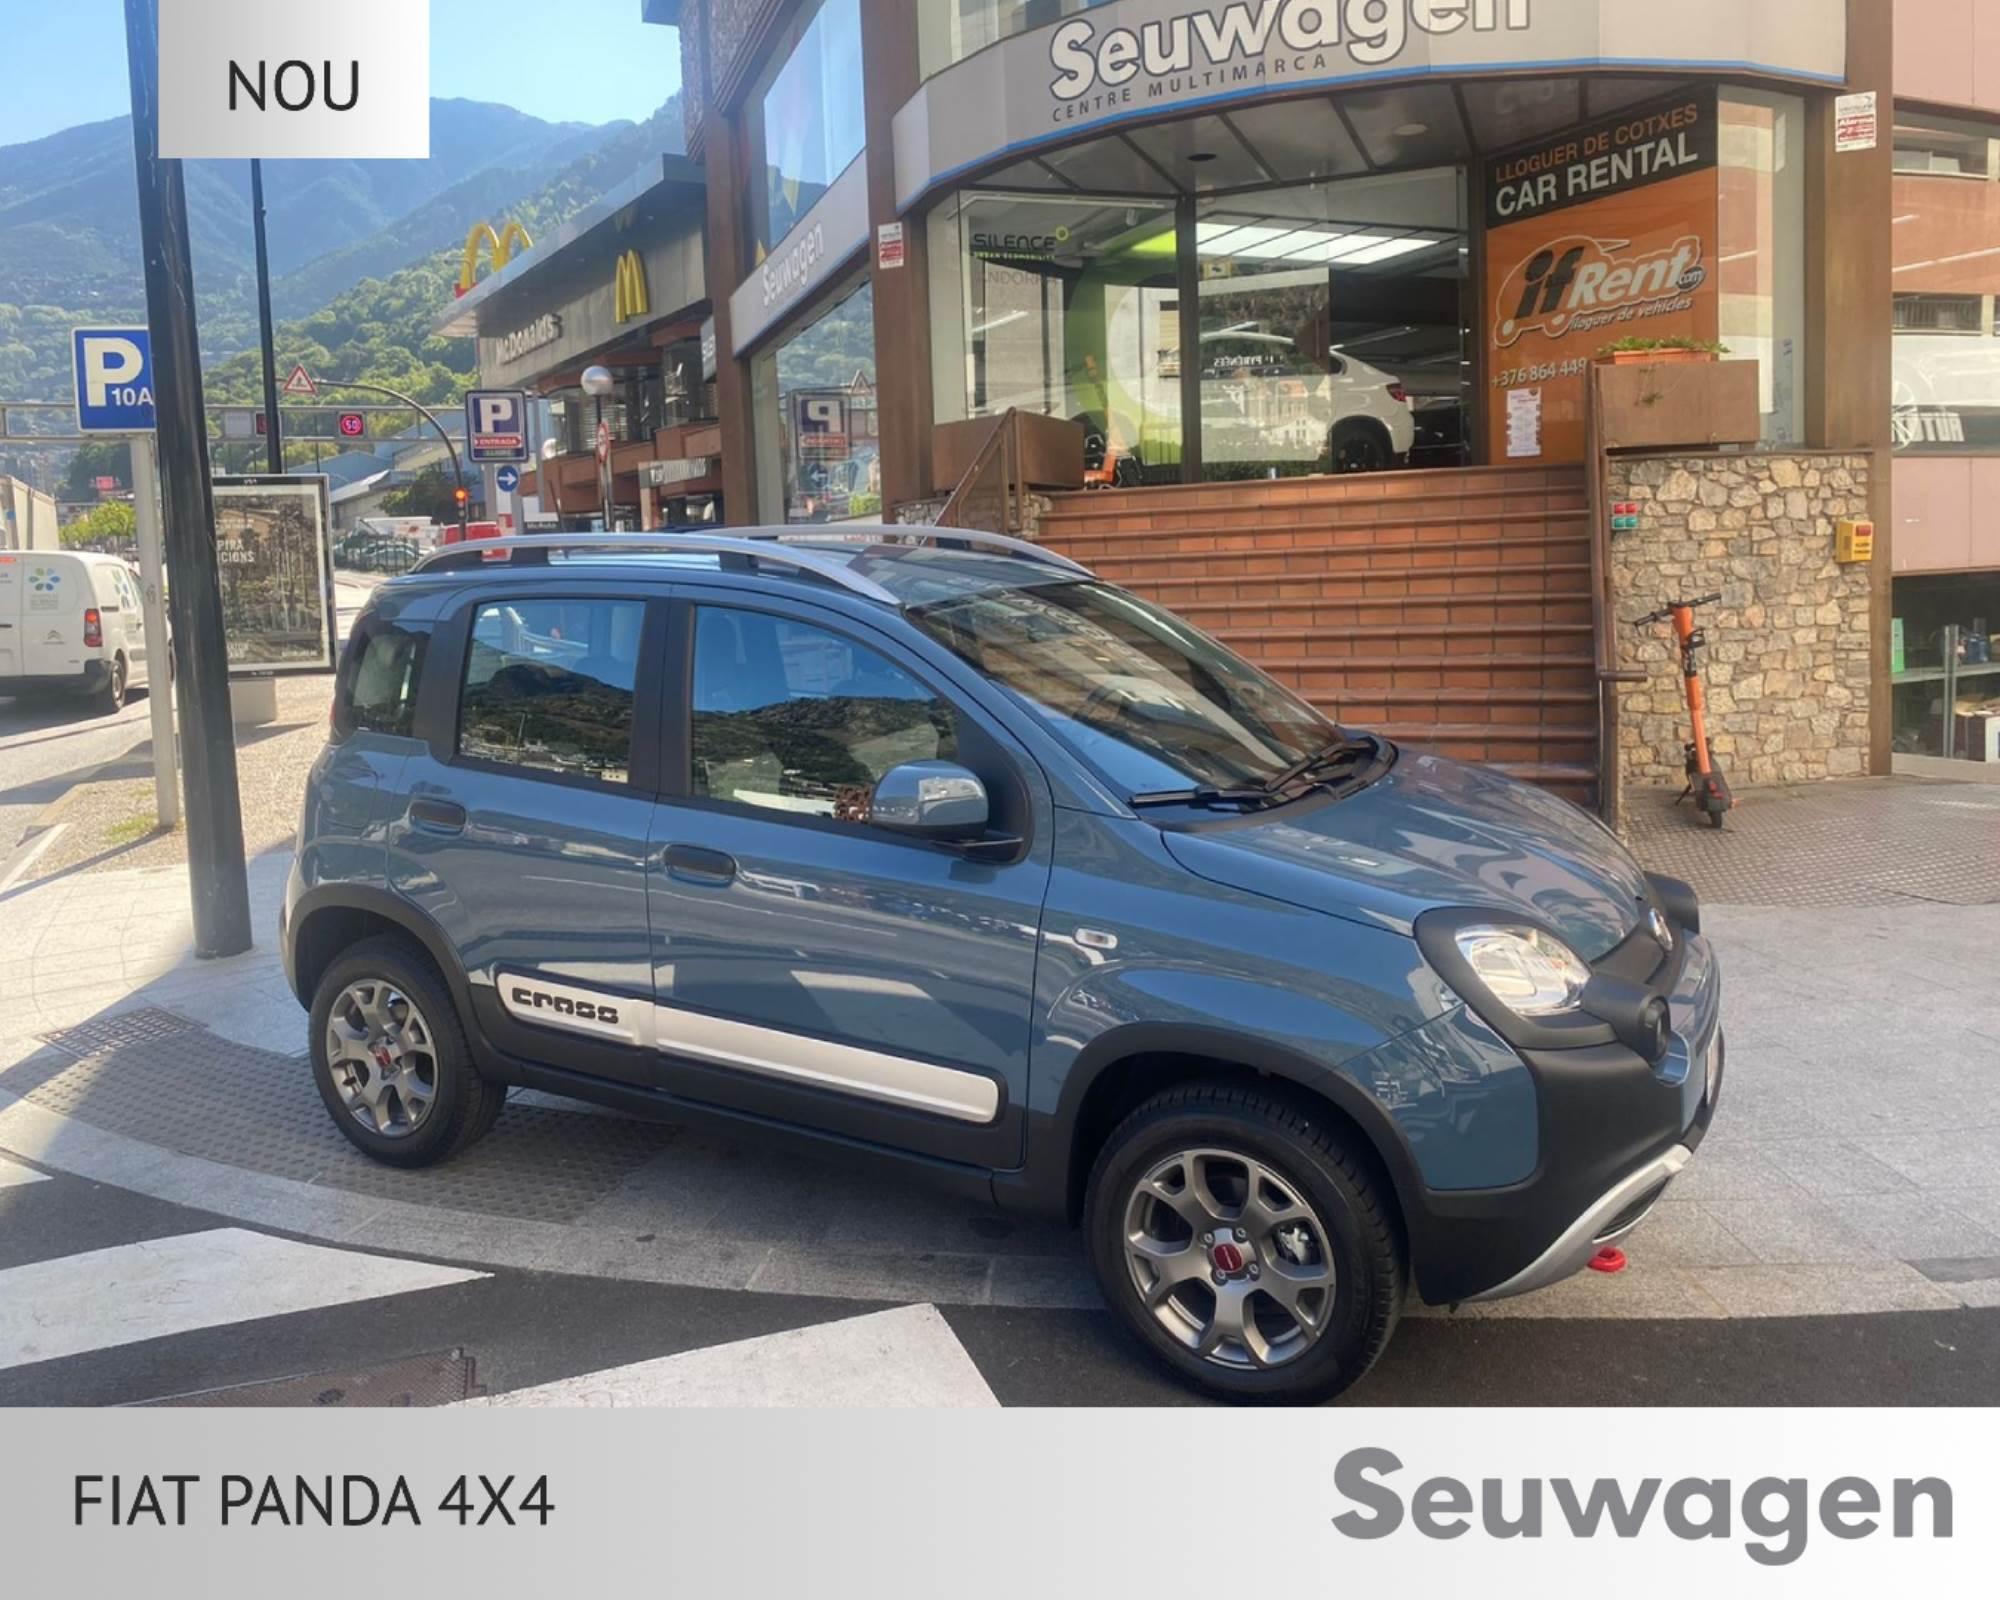 Fiat - Panda - 4x4 4x4 Benzina  2021  00 Km